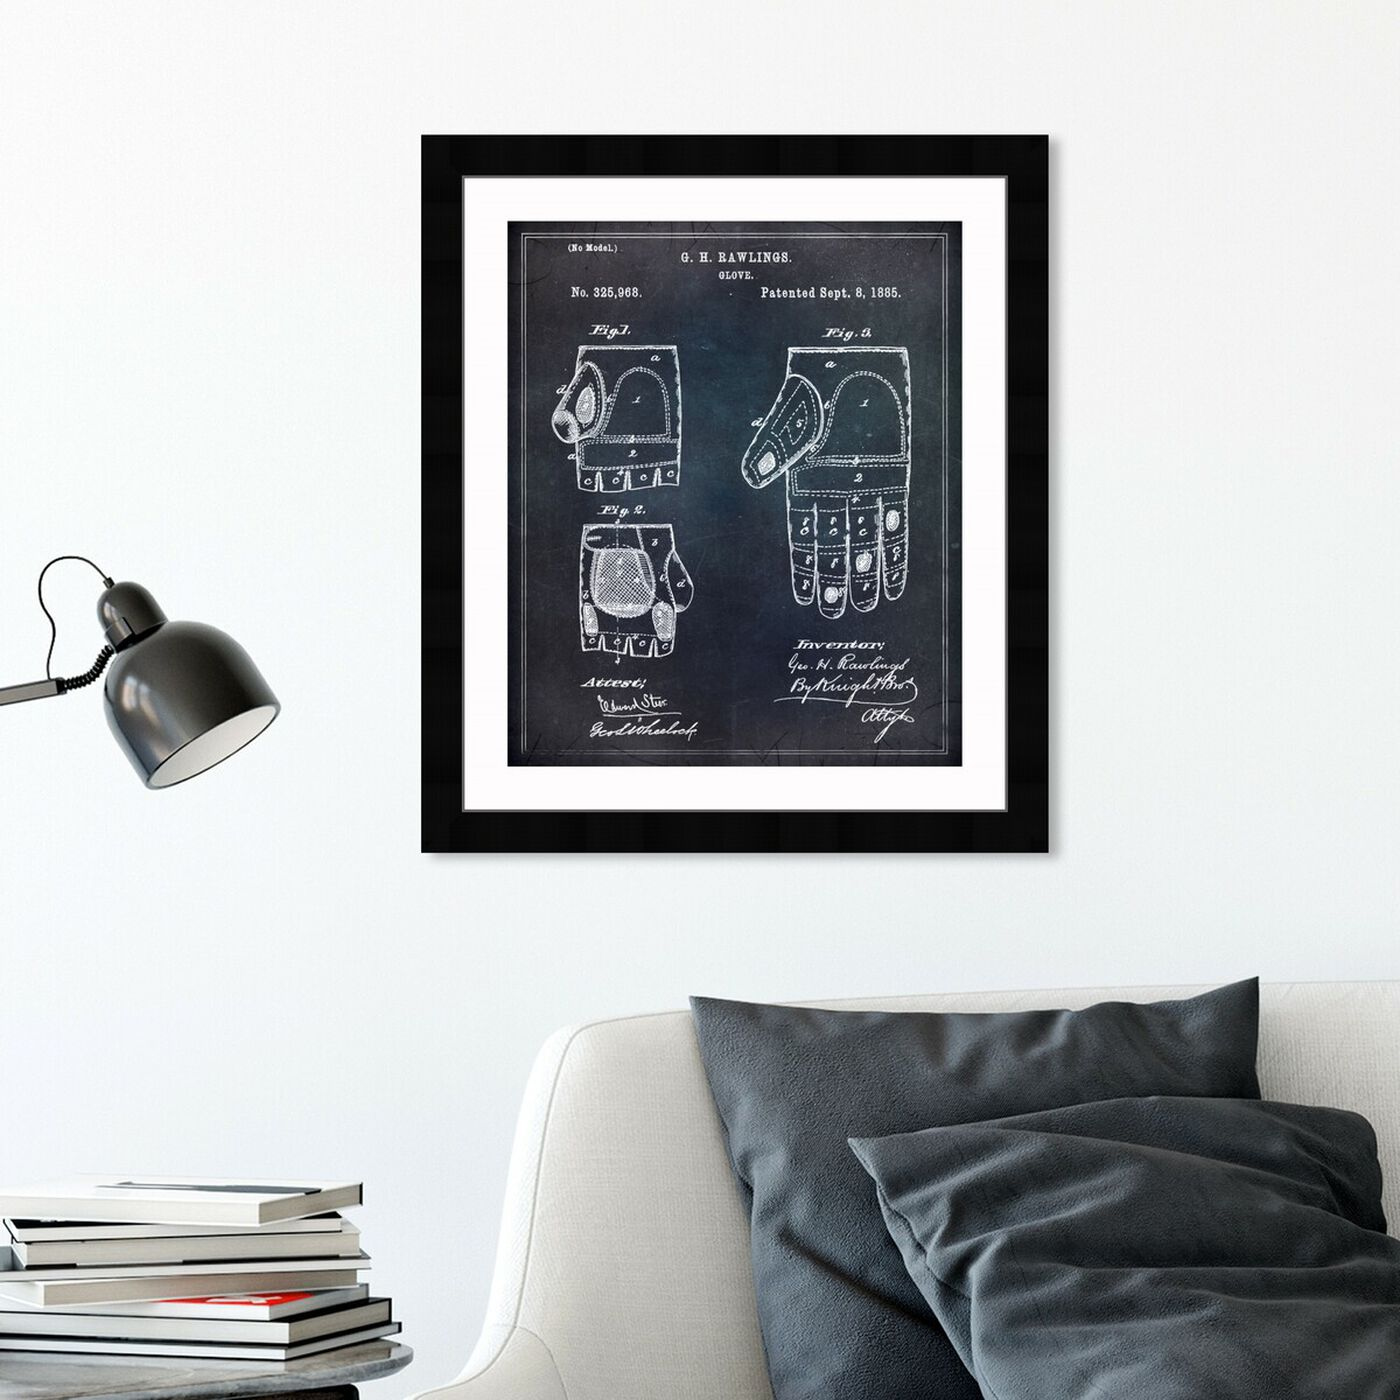 Hanging view of Rawlings Baseball Mitt featuring sports and teams and baseball art.